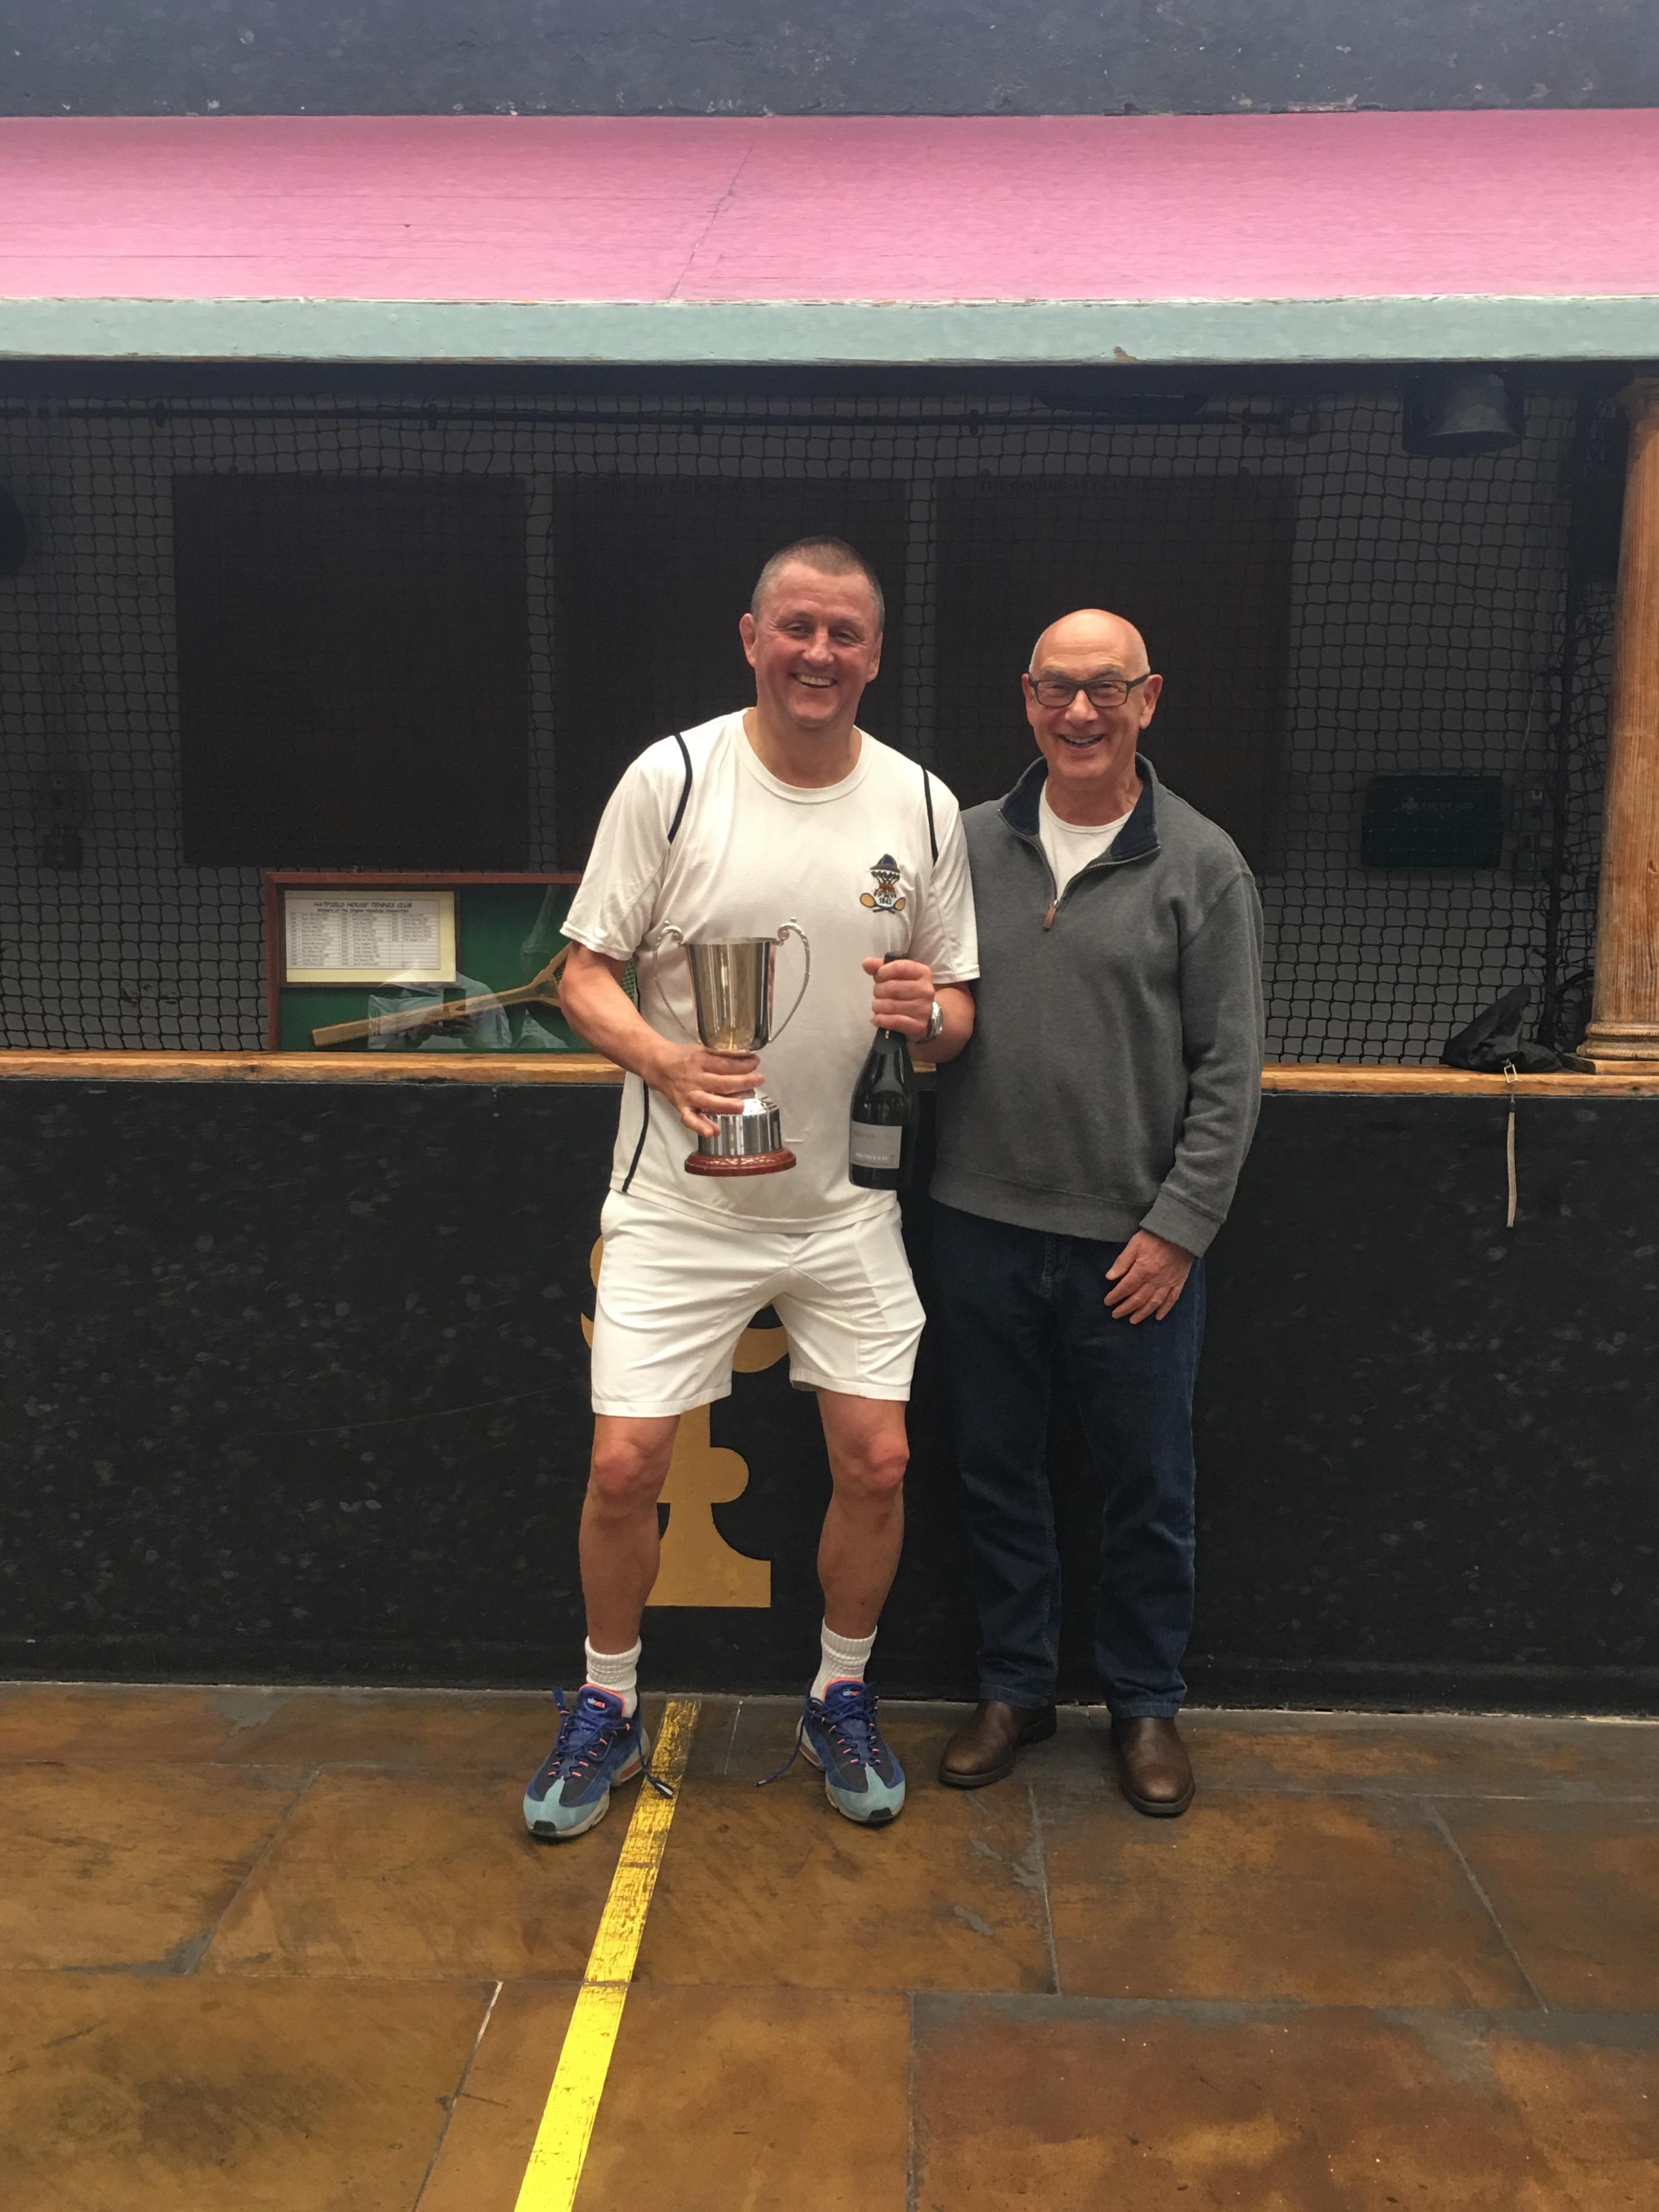 Hertford Cup Div 2 - 2017